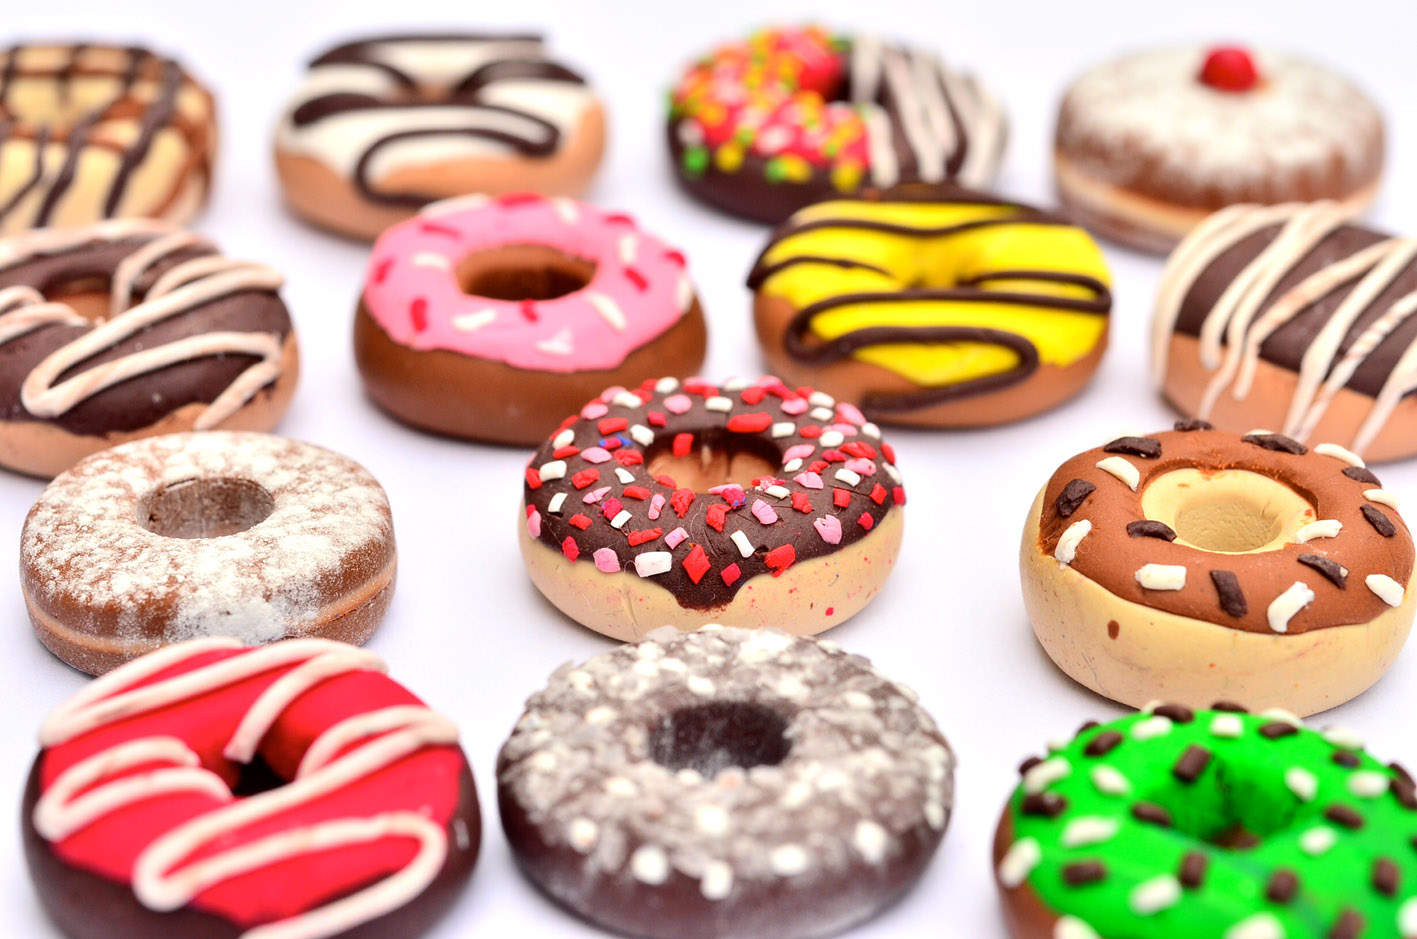 Dunkin donuts пончики